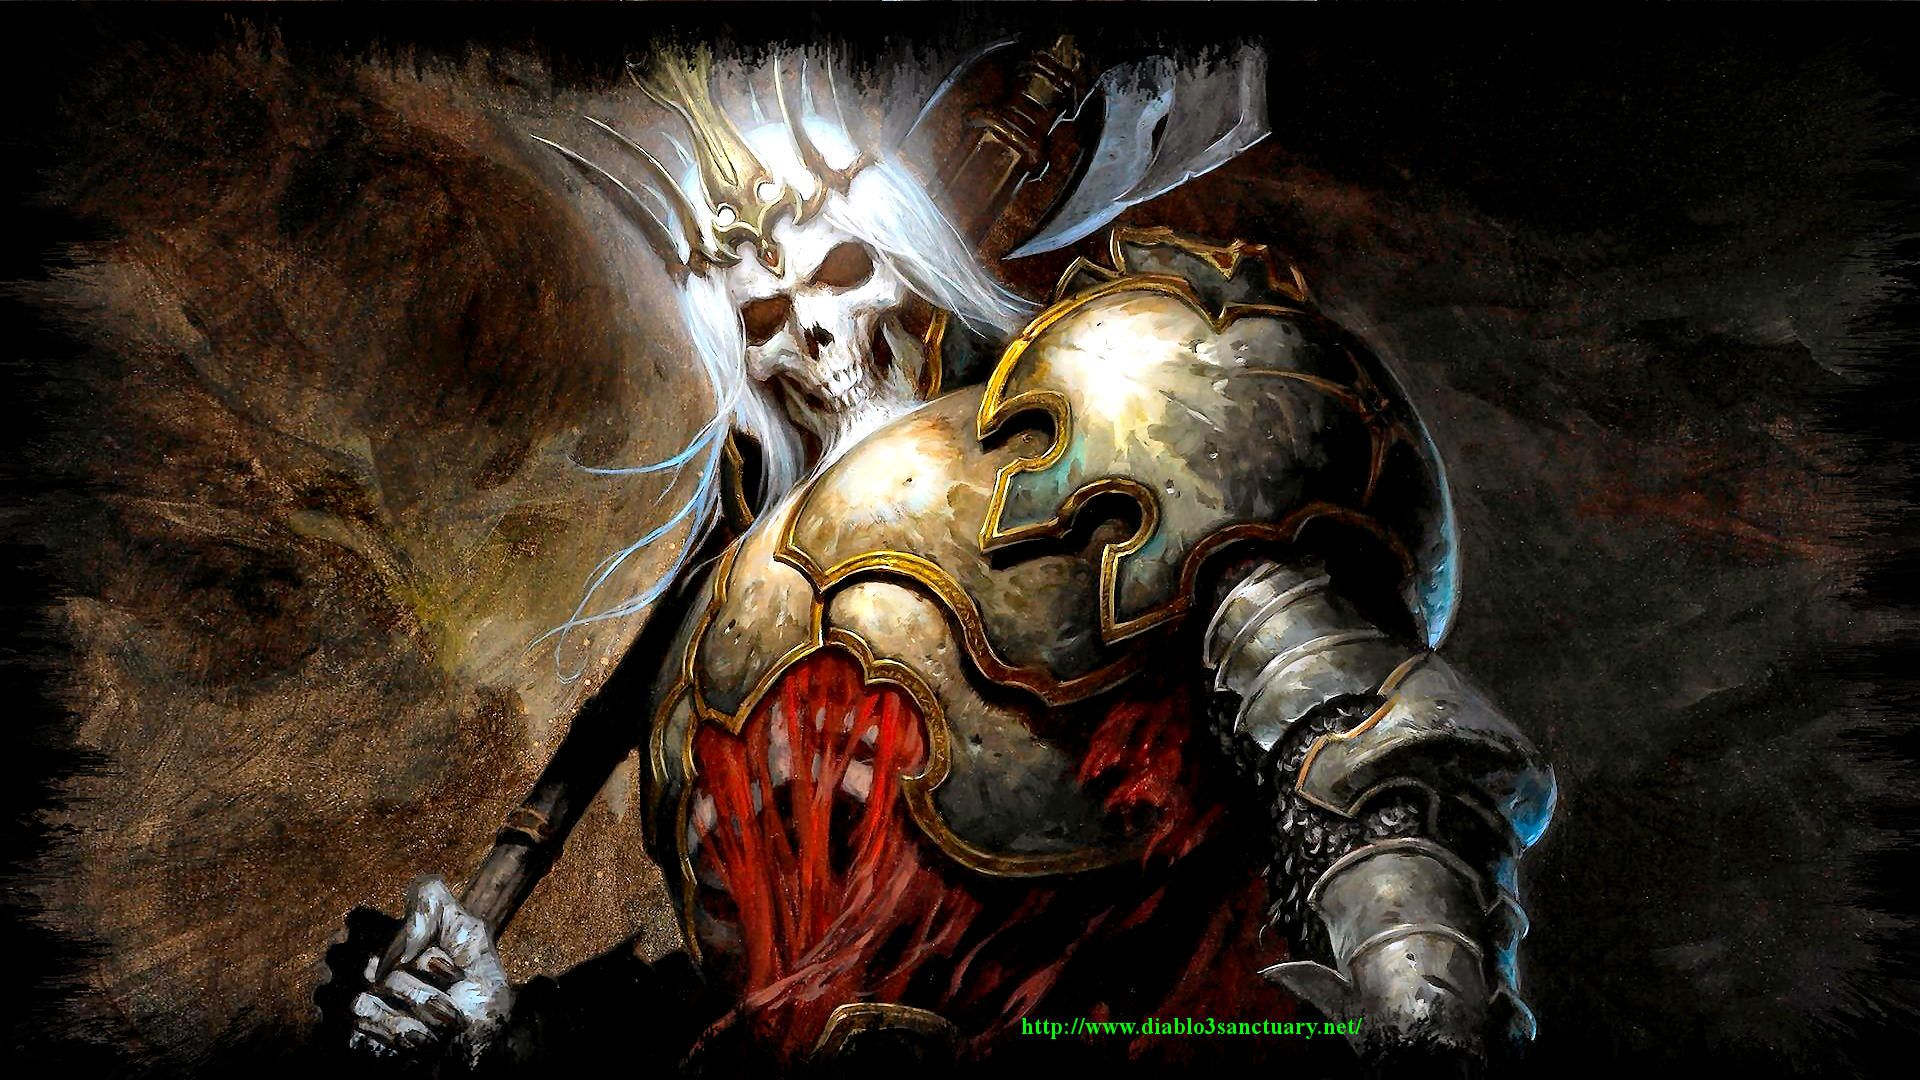 Skeleton King Diablo 3 Wallpapers Hd Free 390640 Diablo